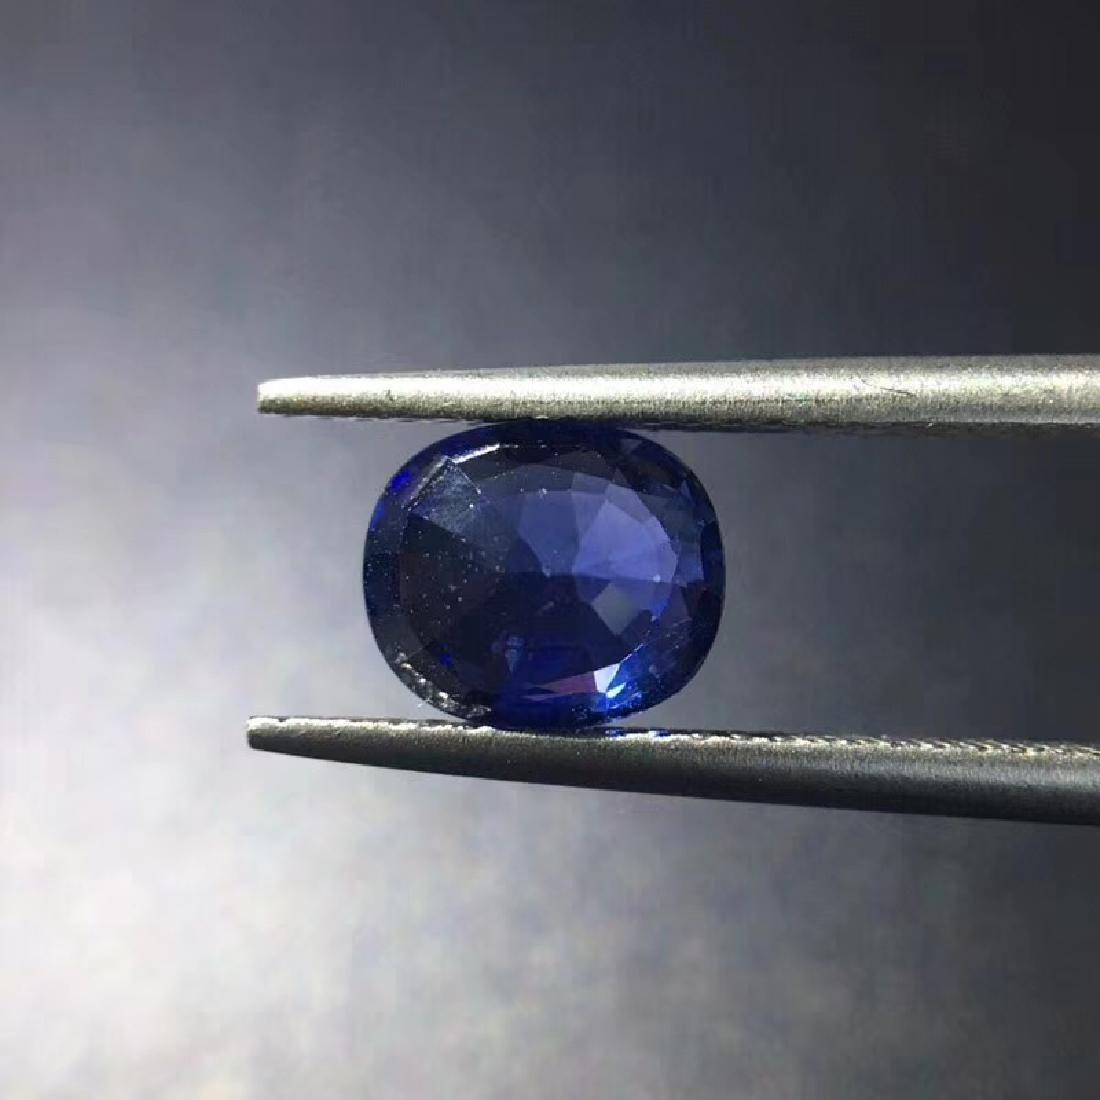 1.68 ct Sapphire 7.5*6.4*3.6 mm Oval Cut - 4